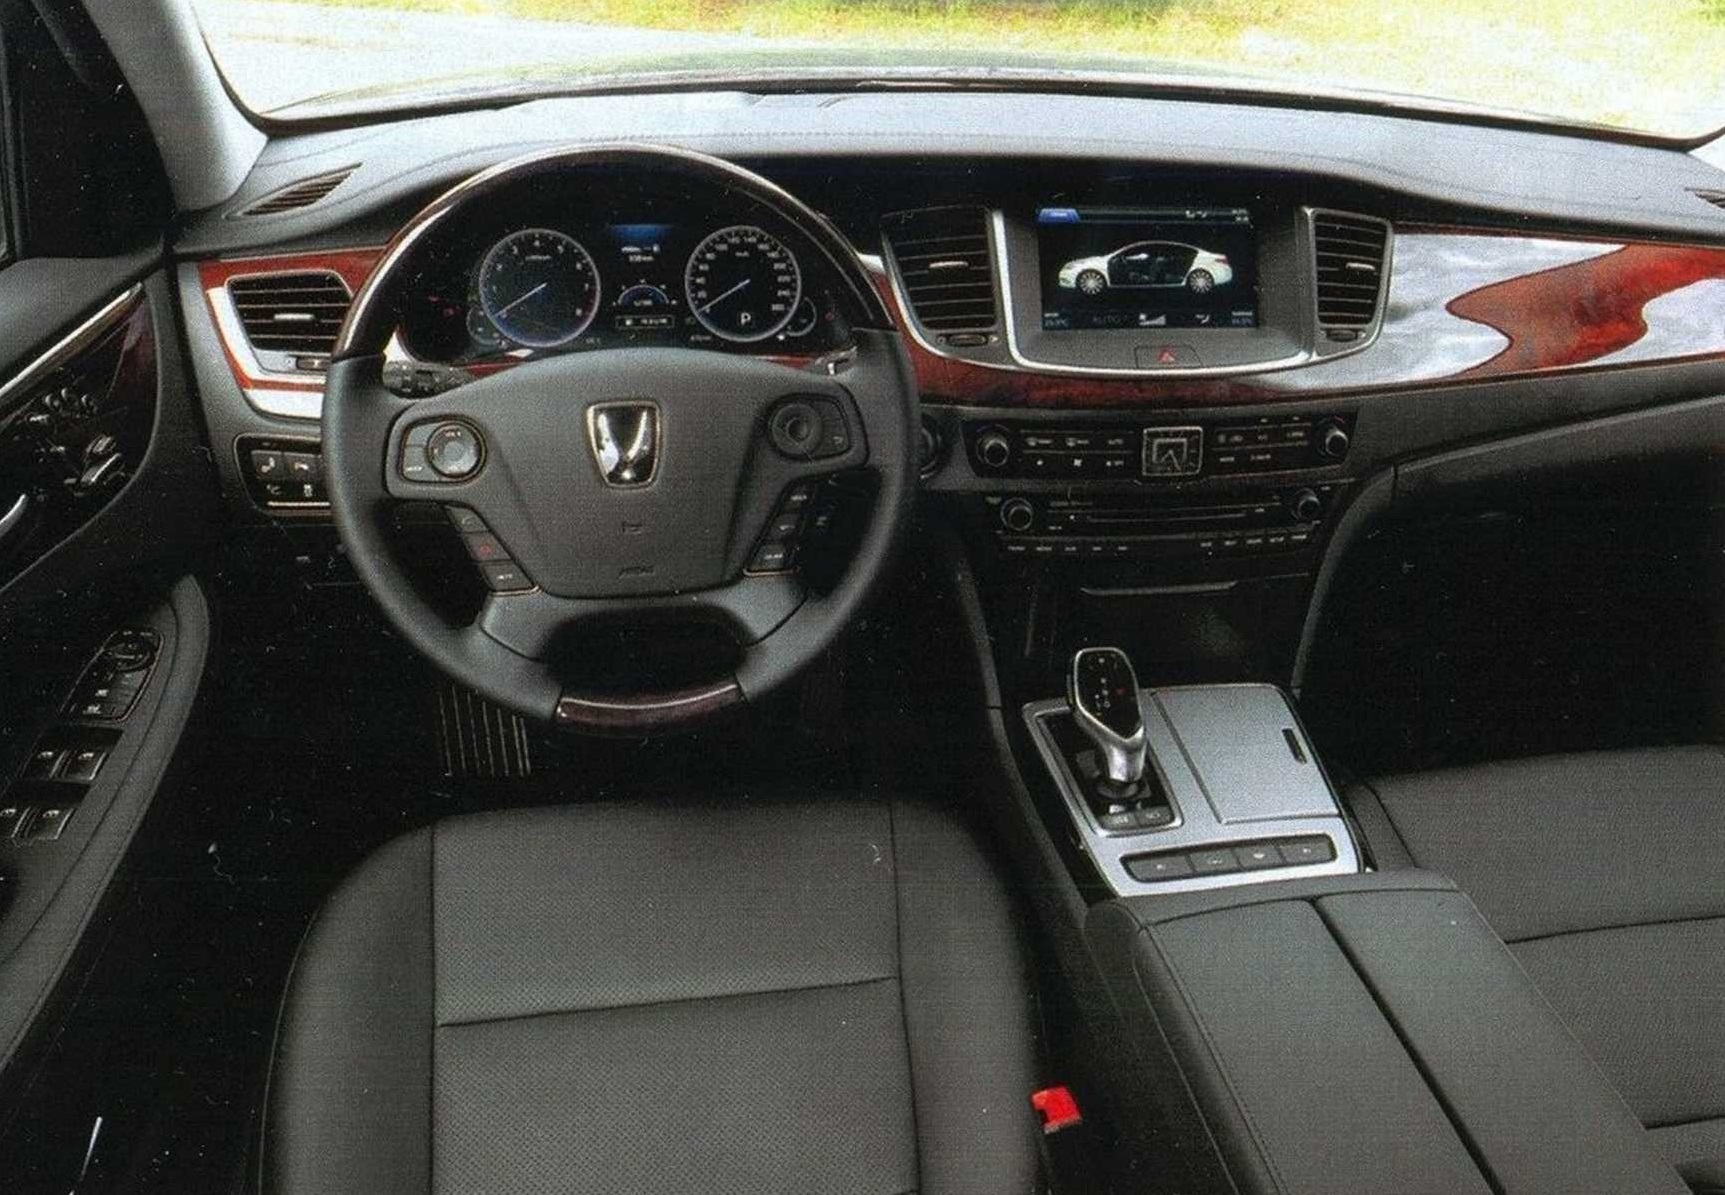 Тест VW Phaeton, Jaguar XJ, Hyundai Equus и Kia Quoris